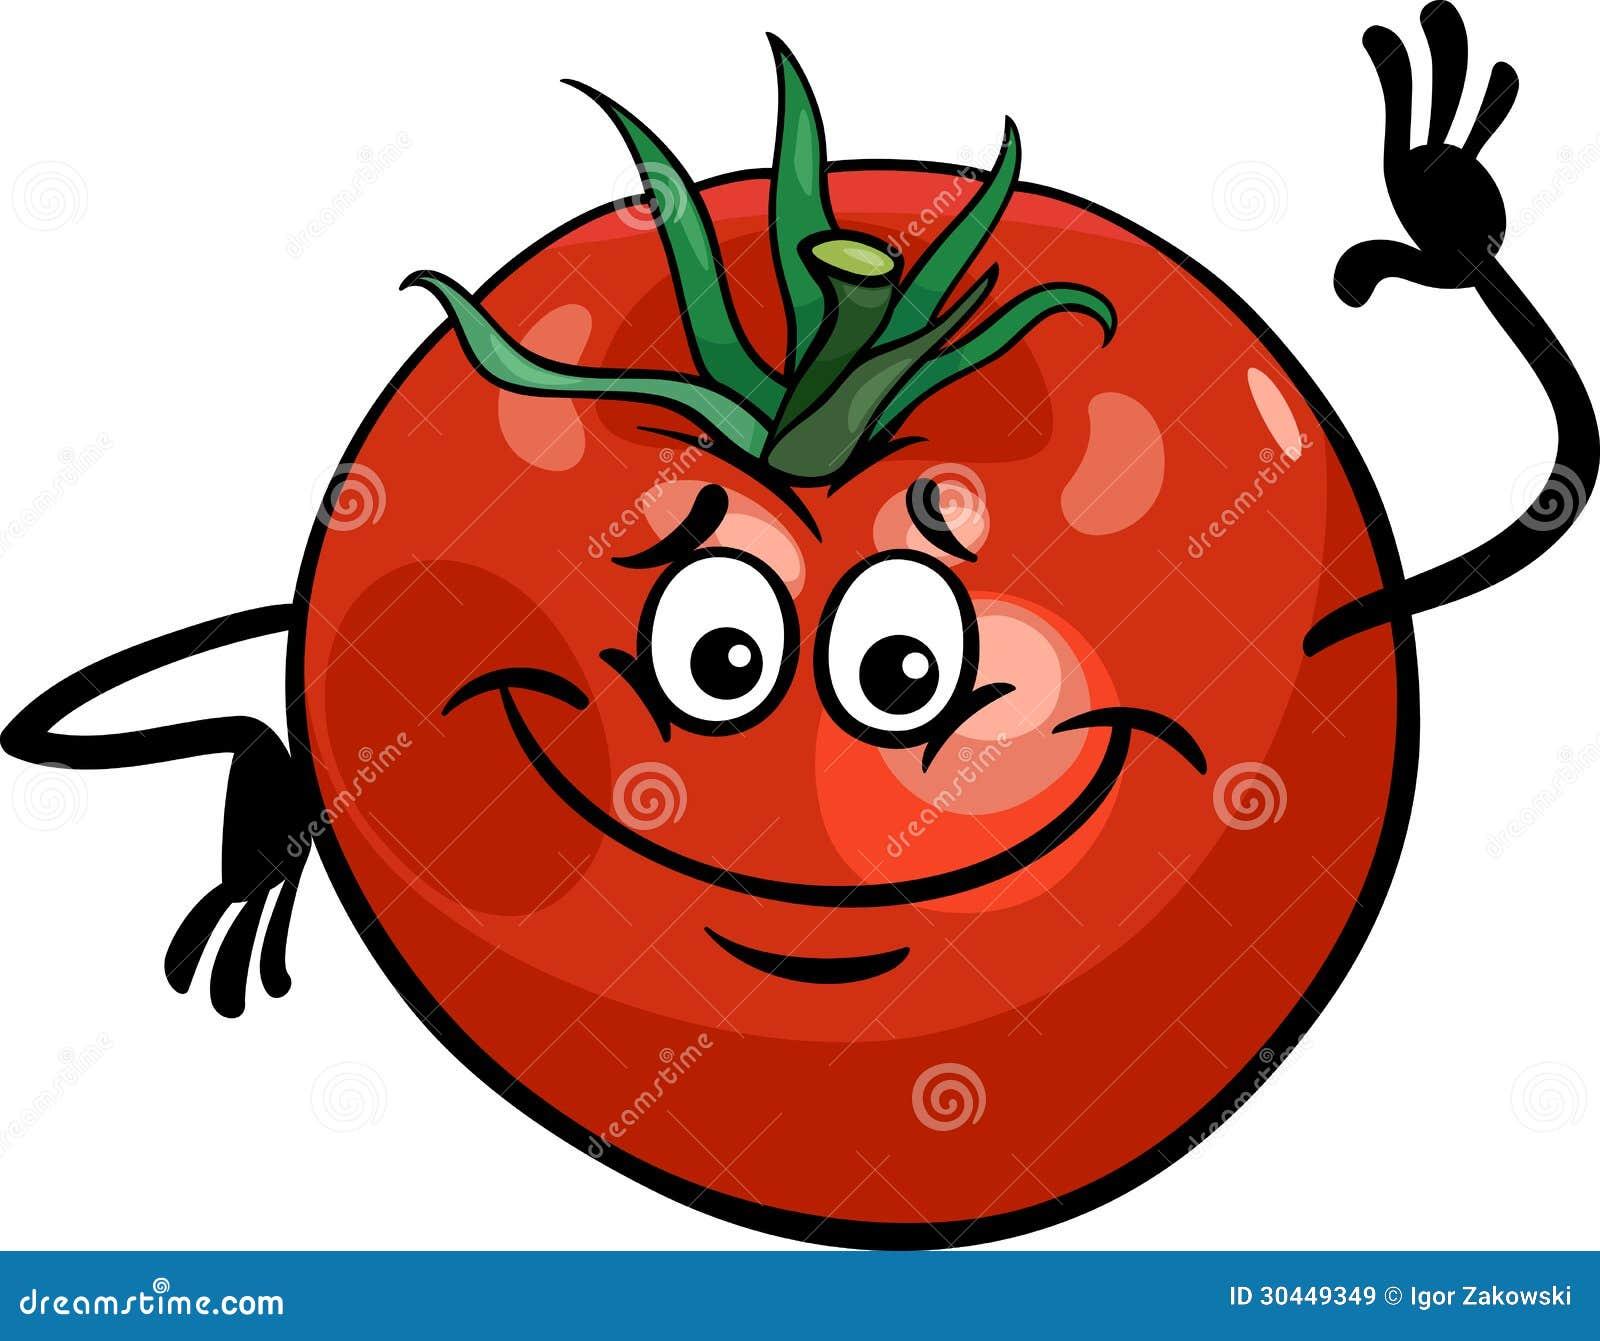 Cute Tomato Vegetable Cartoon Illustration Stock Vector ...